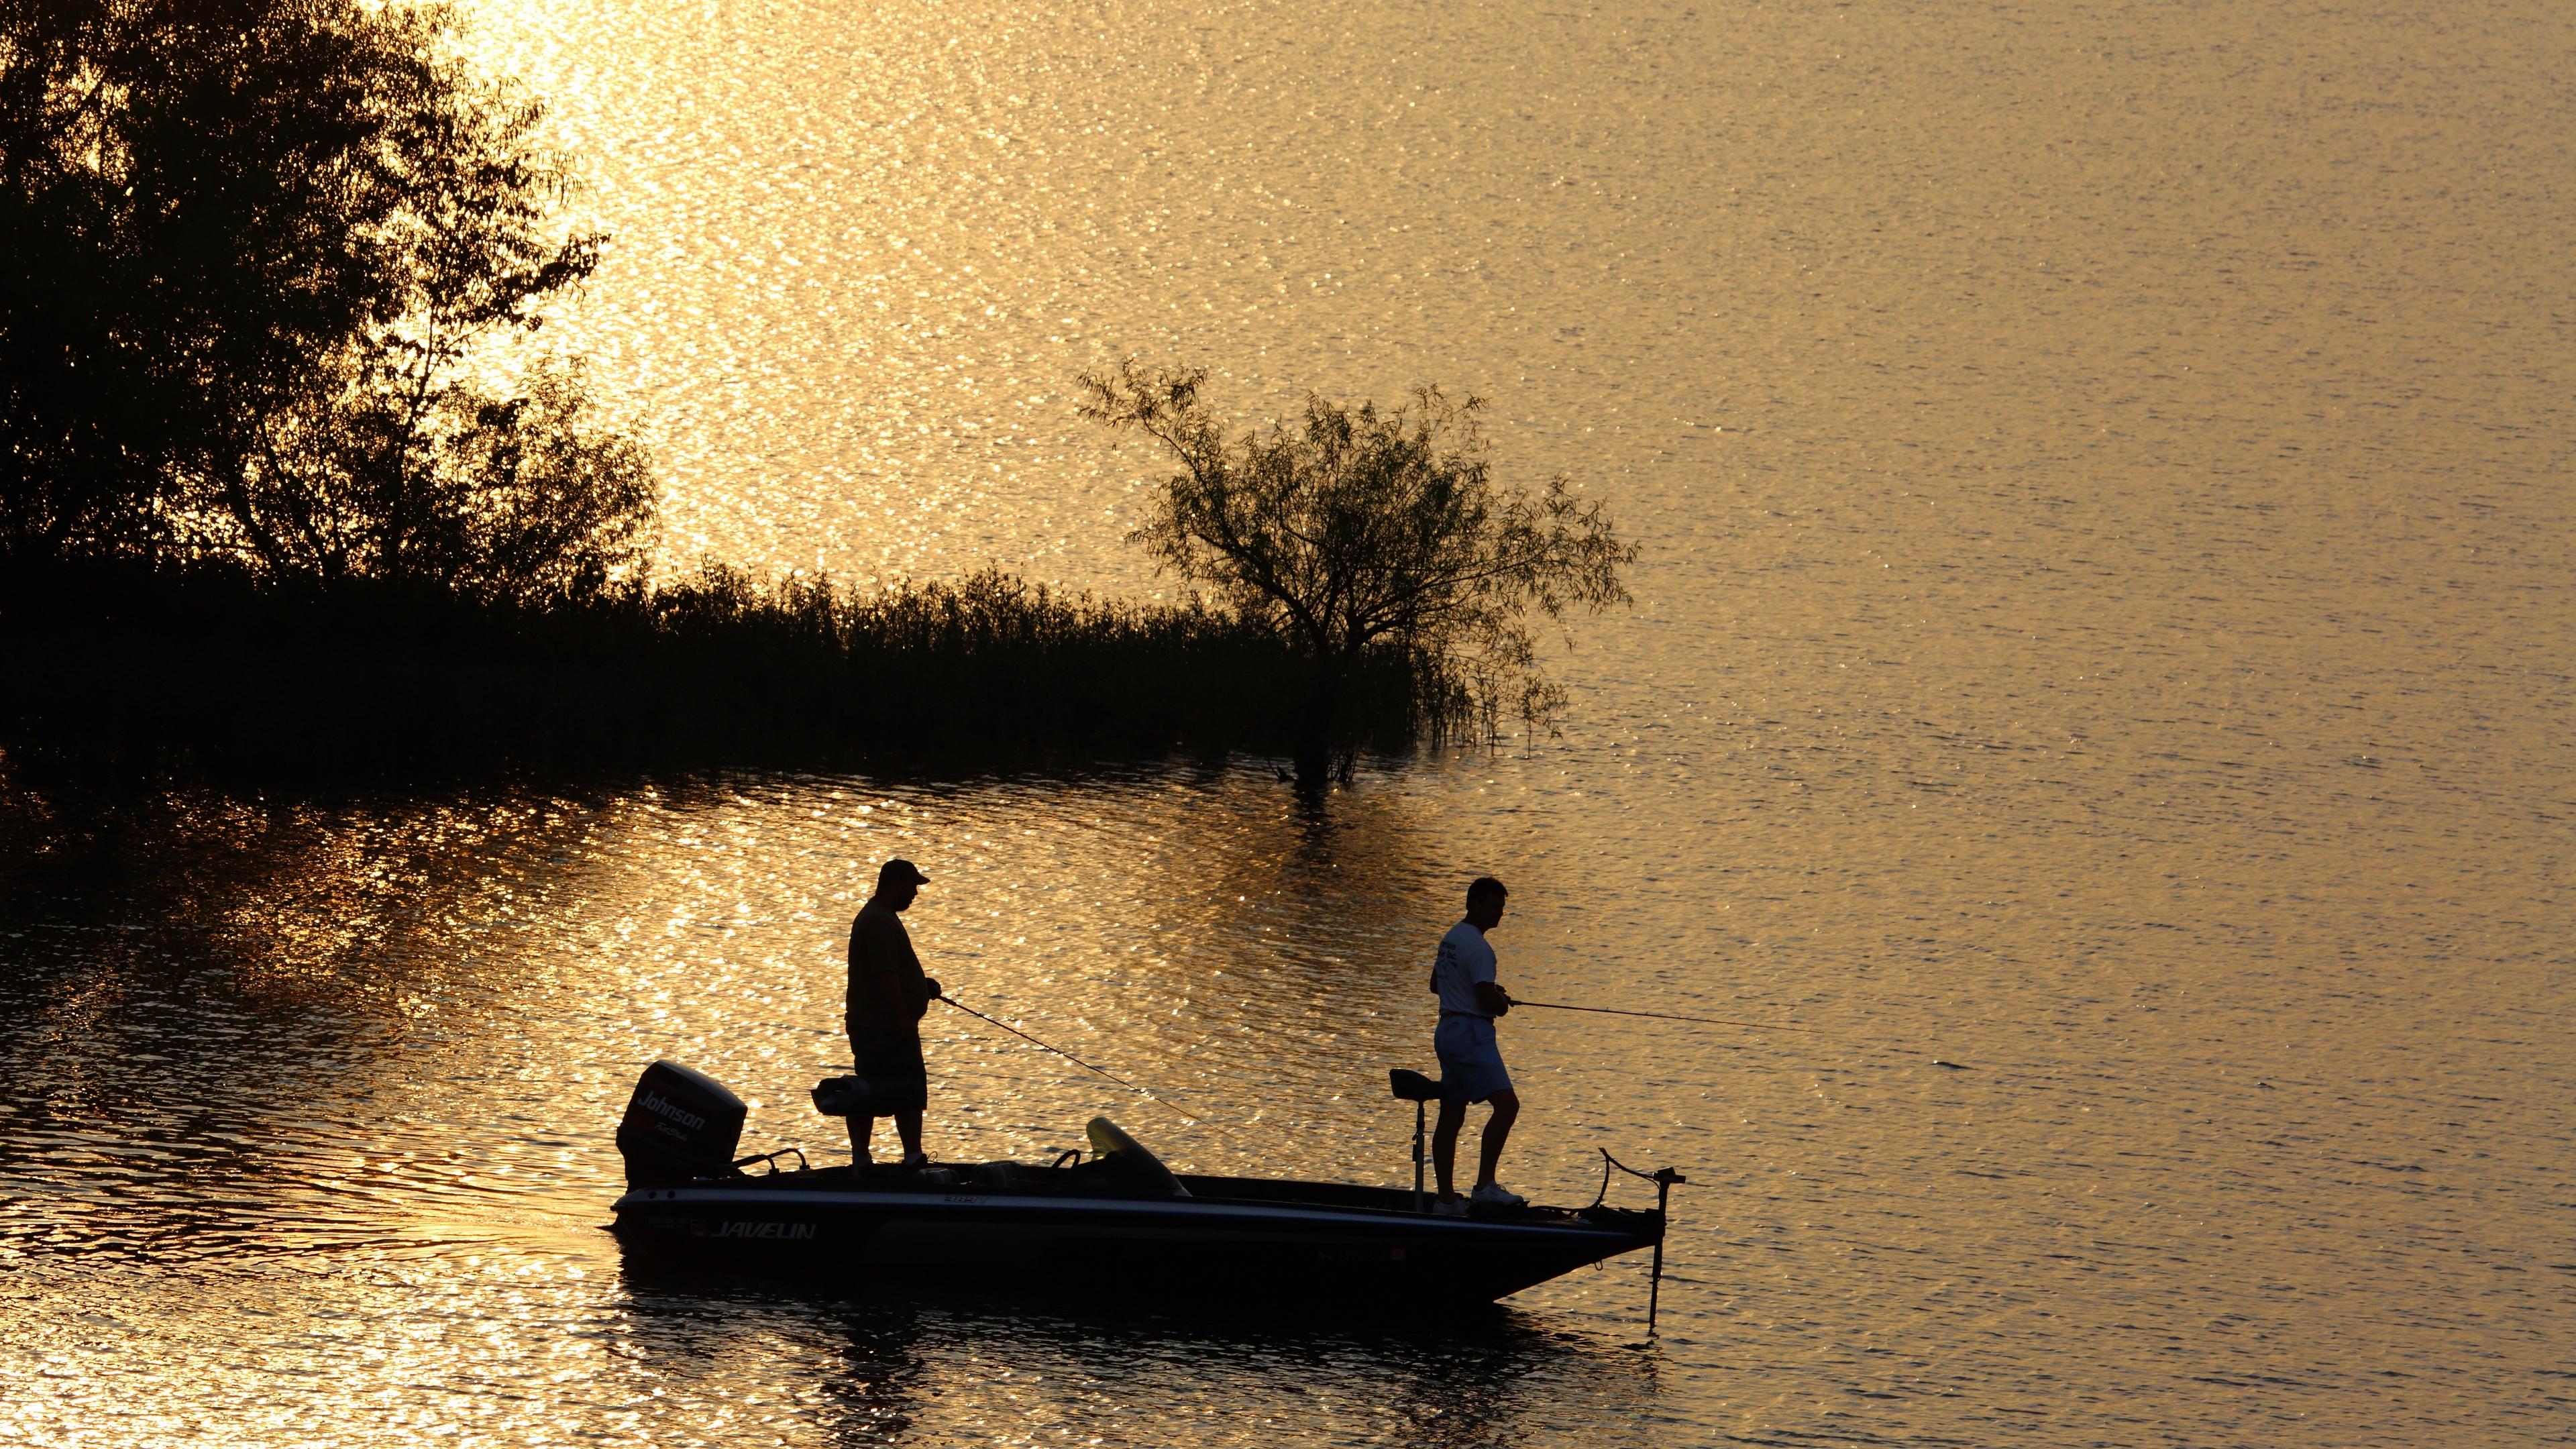 Рыбак на лодке картинка, картинка попугая